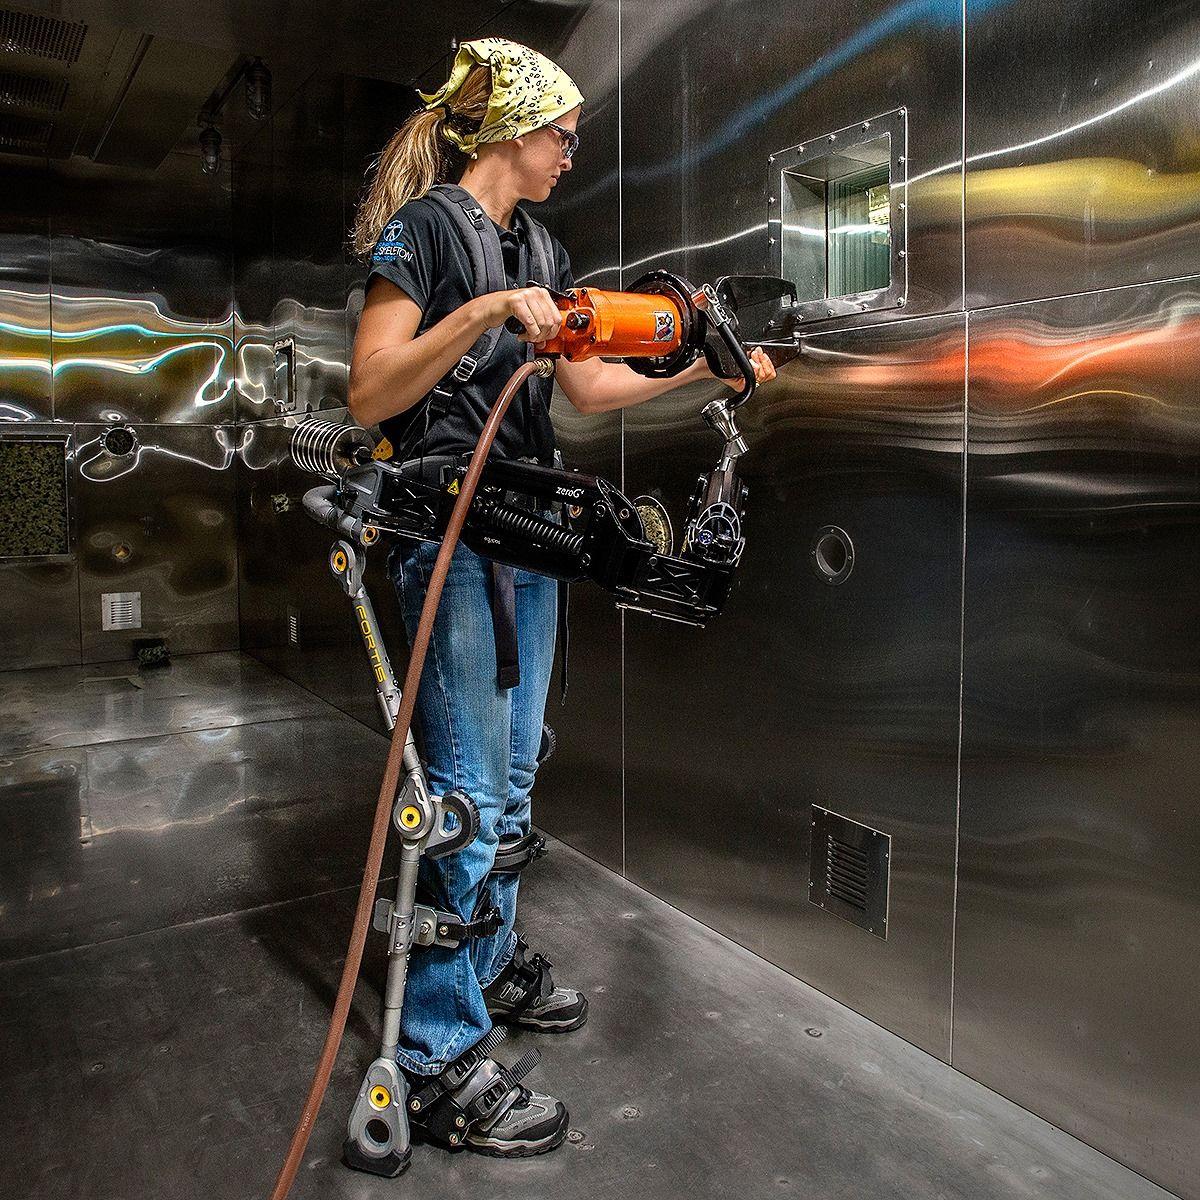 Cyberpunk High Tech Low Life R Cyberpunk Powered Exoskeleton Lockheed Fortis